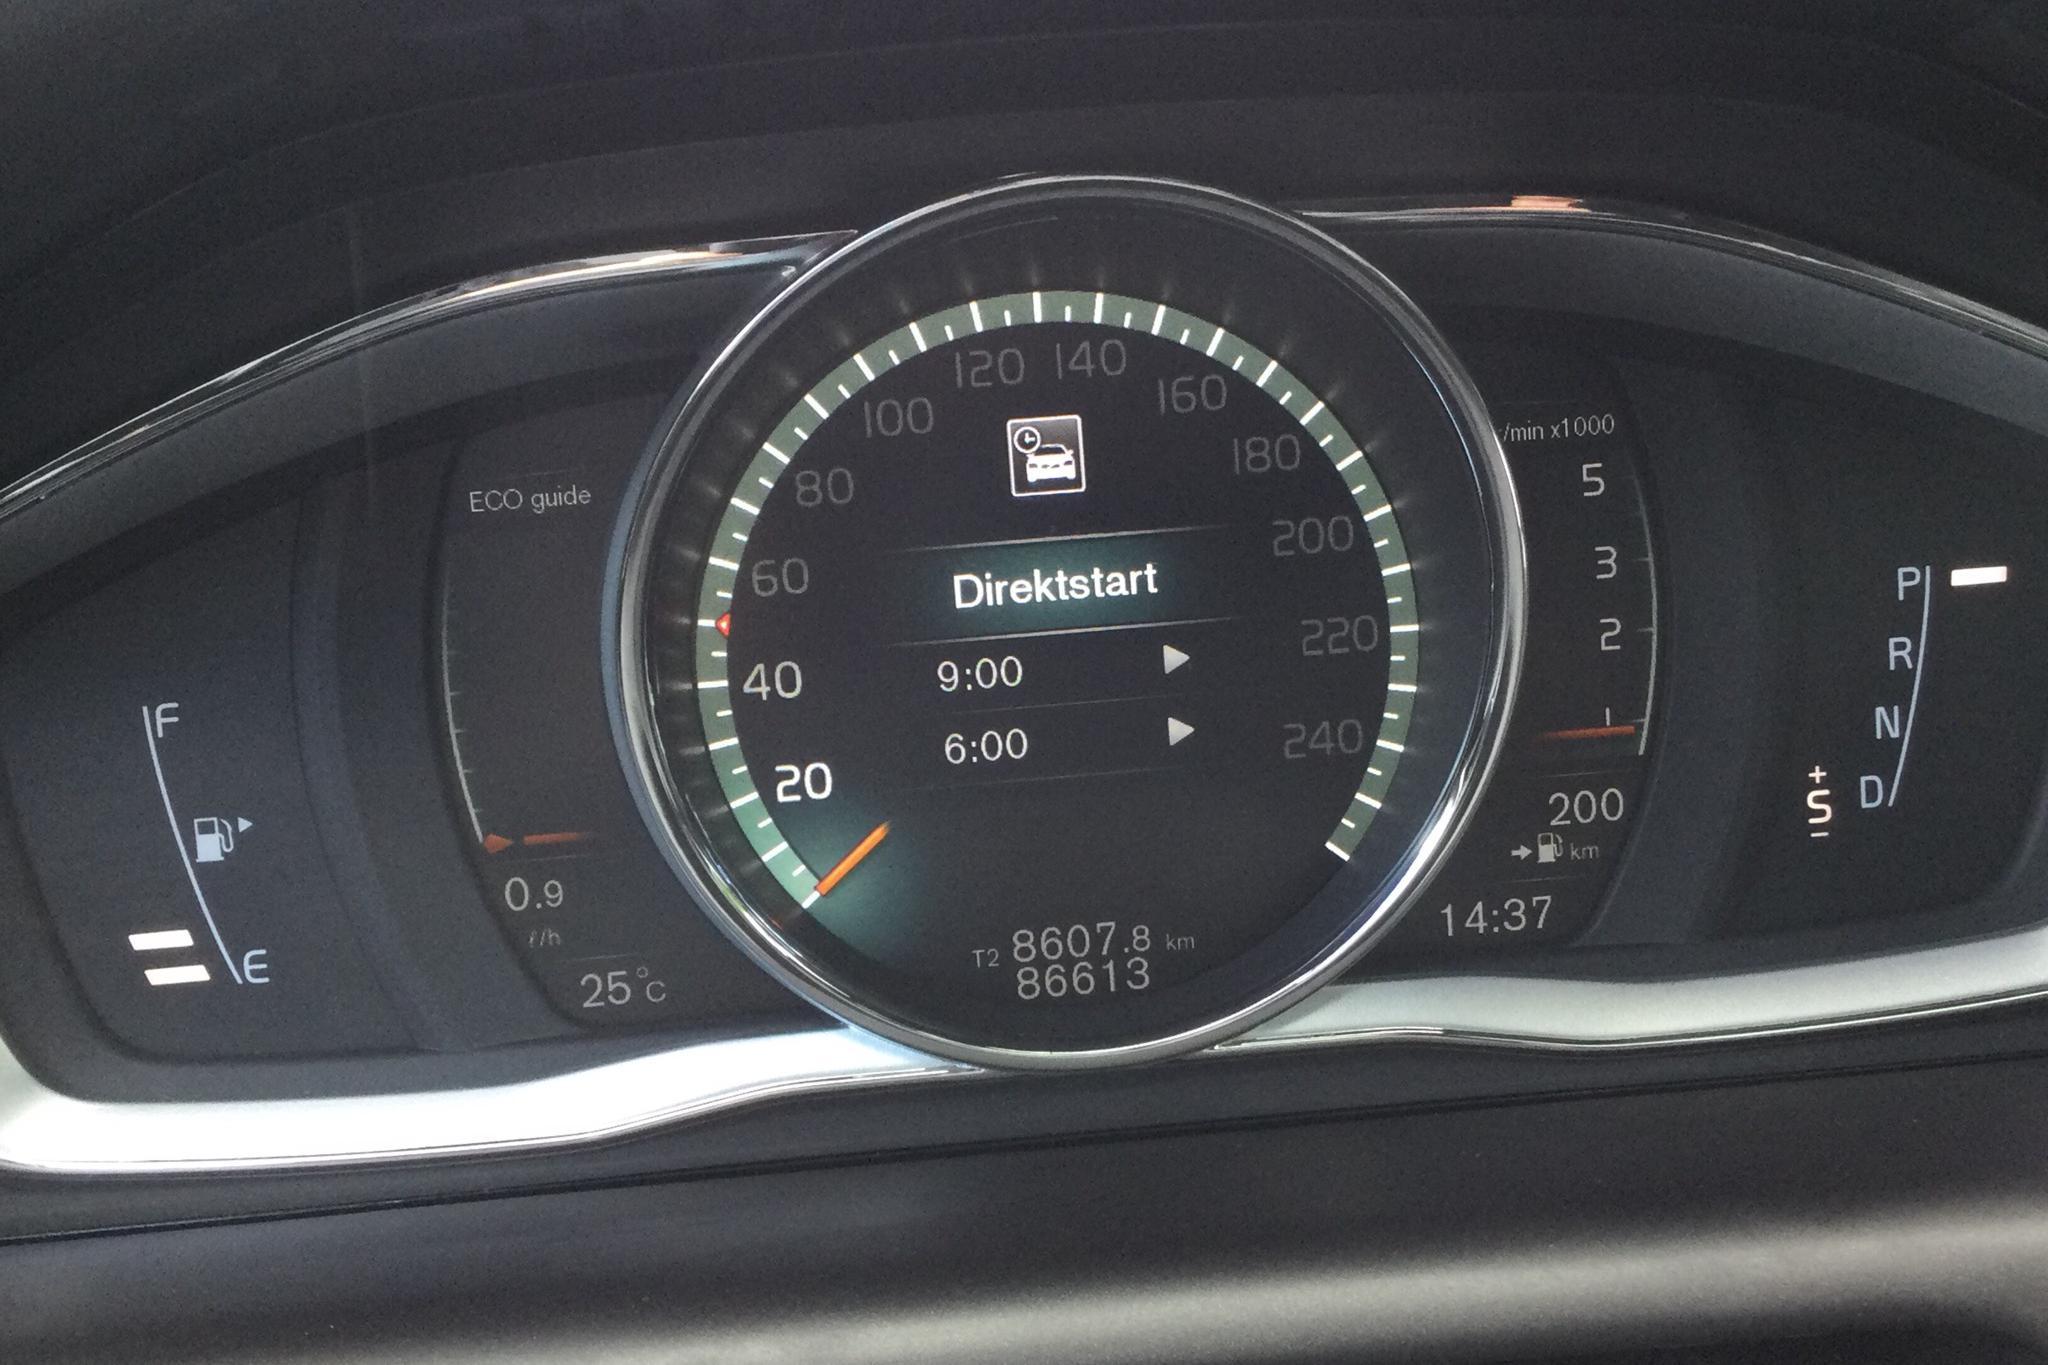 Volvo XC60 D4 AWD (190hk) - 86 610 km - Automatic - black - 2017